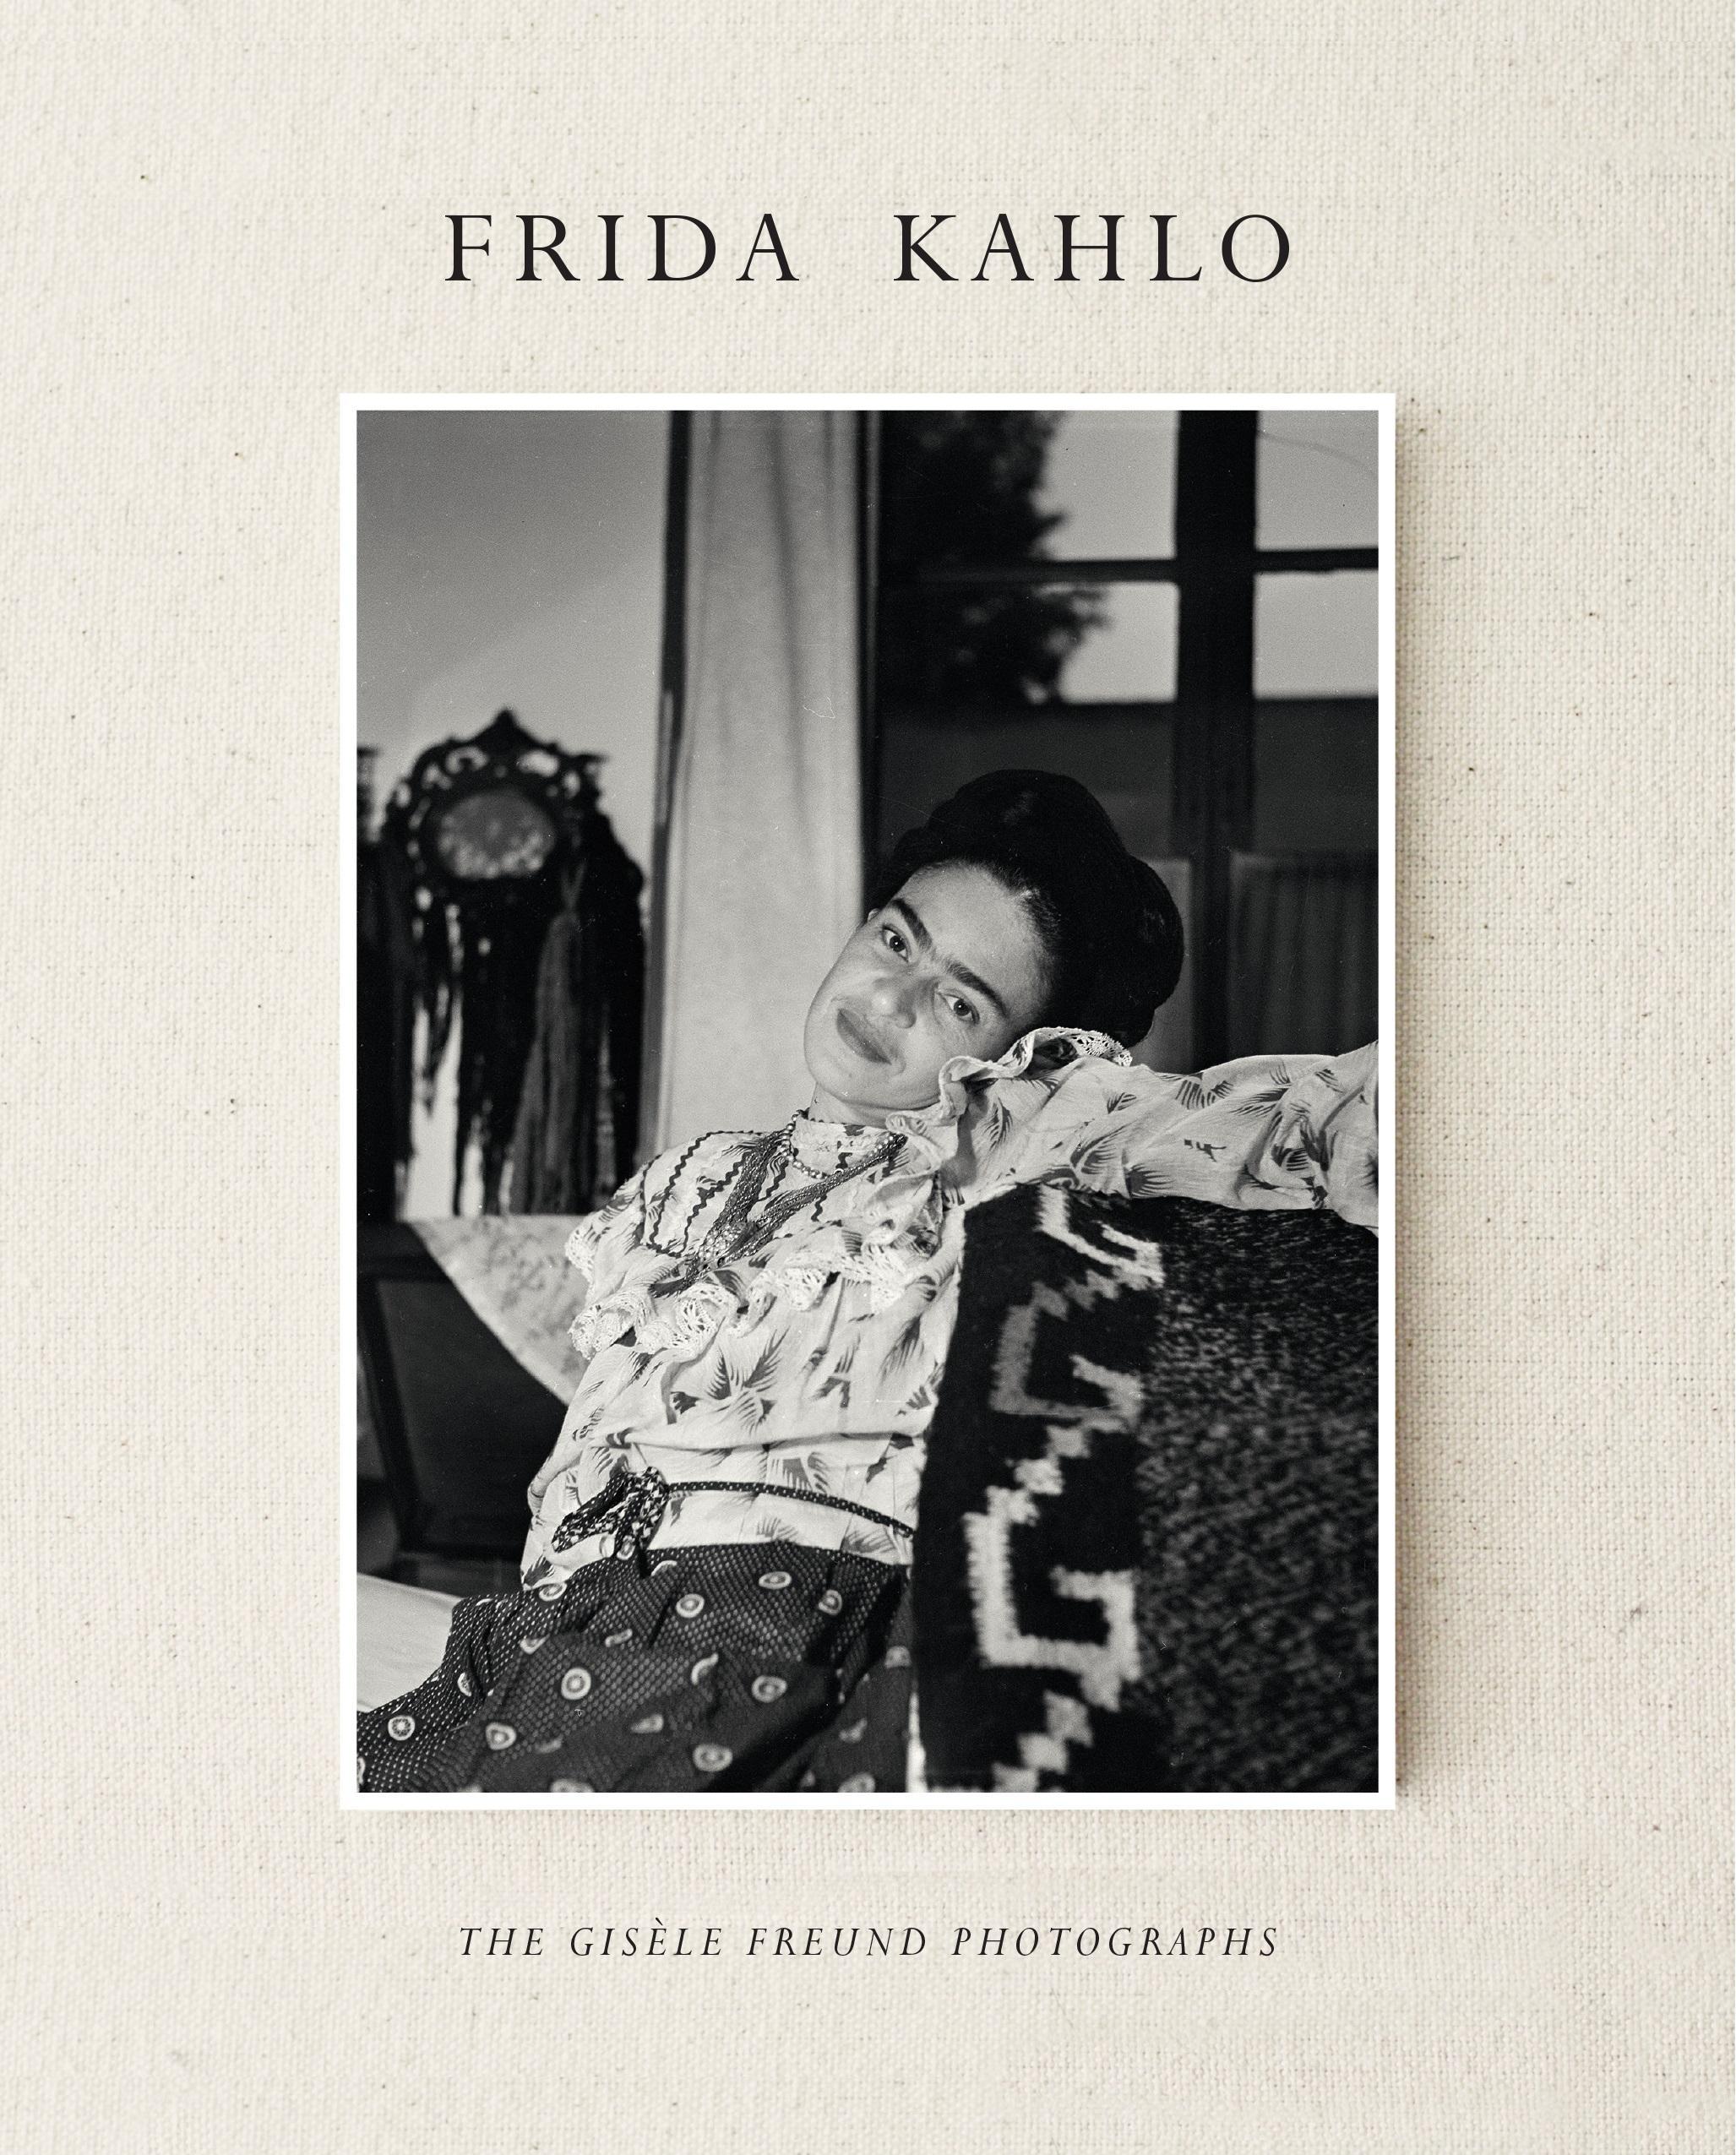 Frida Kahlo  The Gisèle Freud Photographs  Gérad de Cortanze (u. a.)  Buch  Englisch  2015 - Cortanze, Gérad de